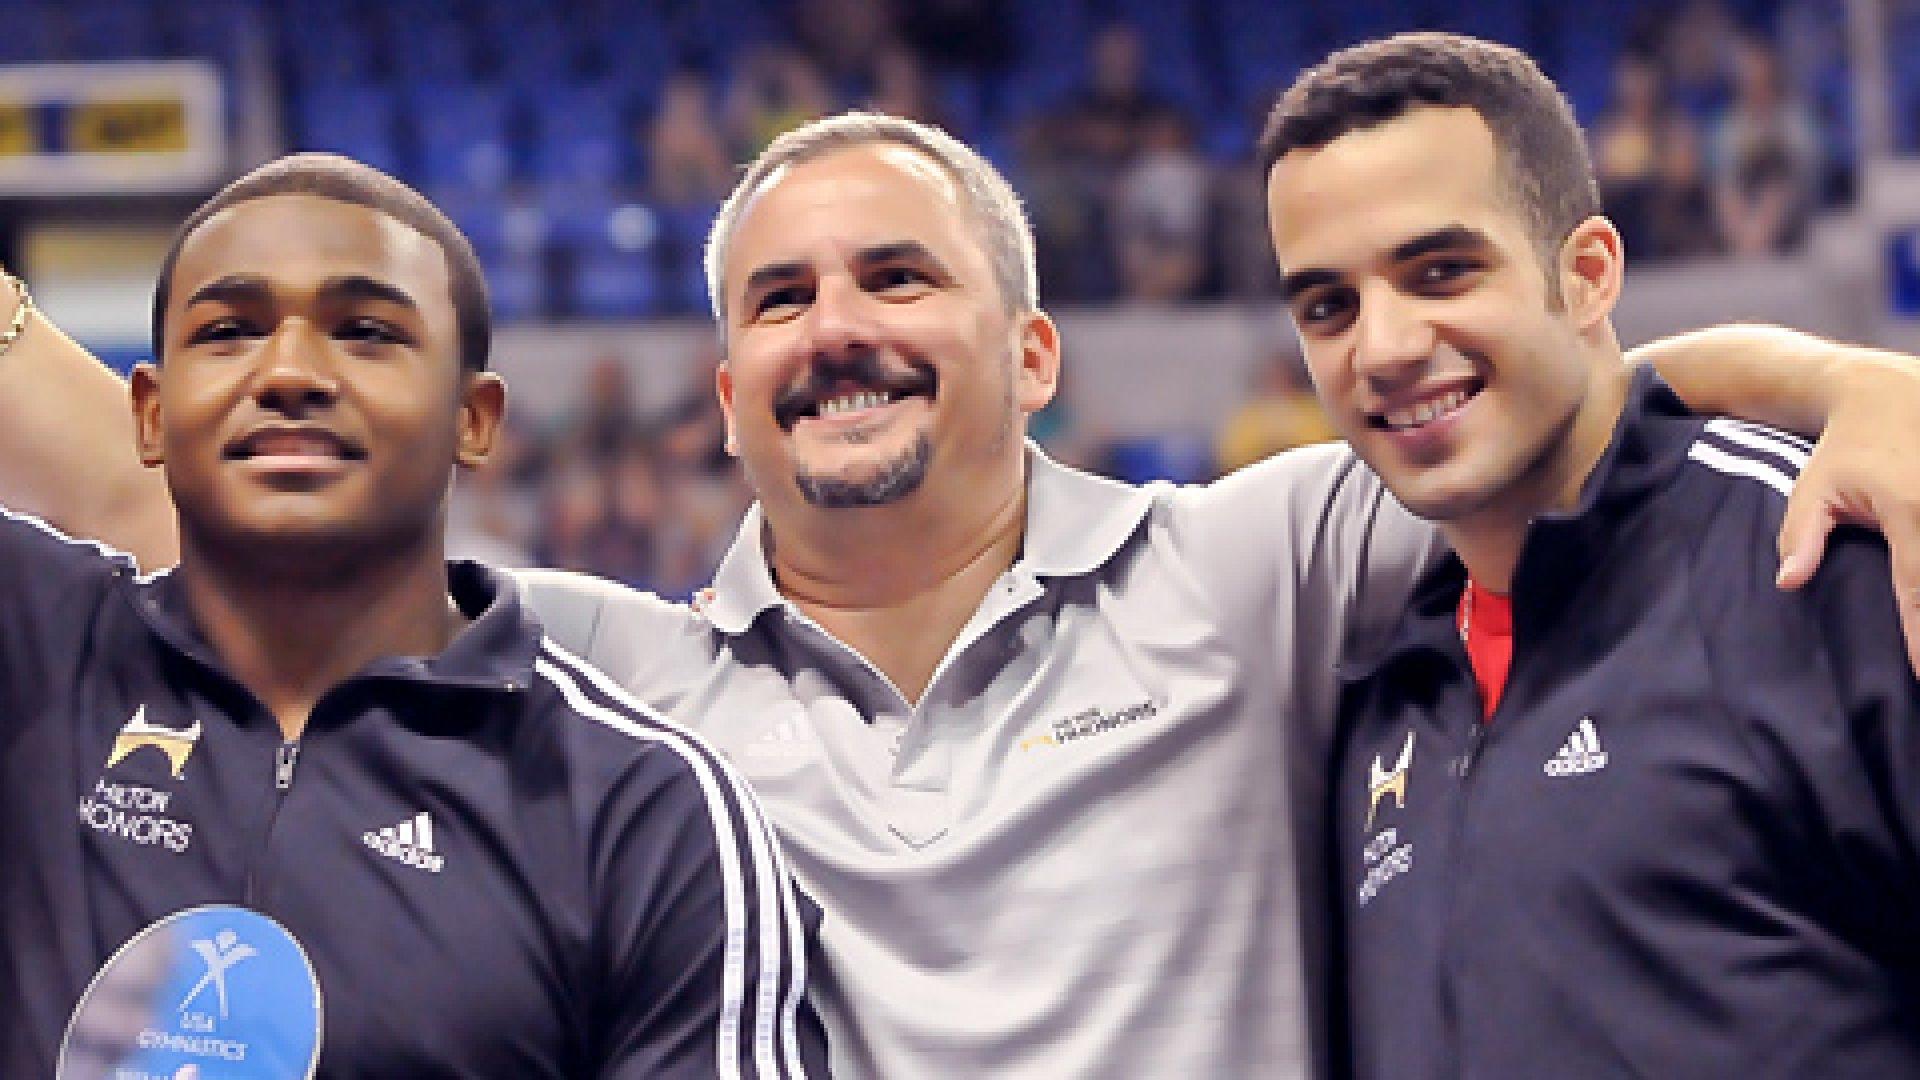 Yin Alvarez (center), with son and gymnast Danell Leyva (right)